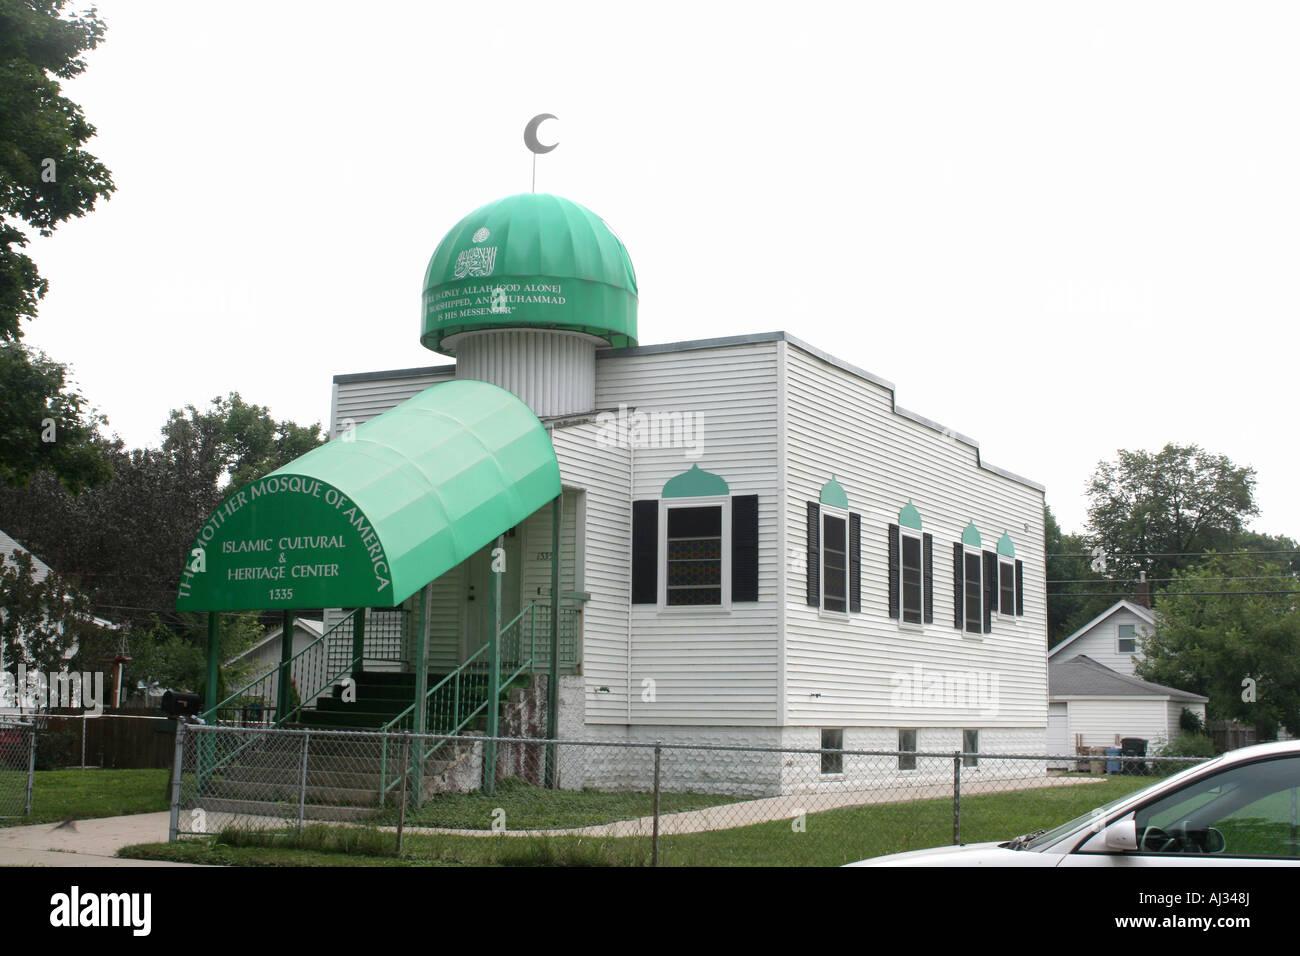 Mother Mosque, Cedar Rapids, Iowa, USA - Stock Image